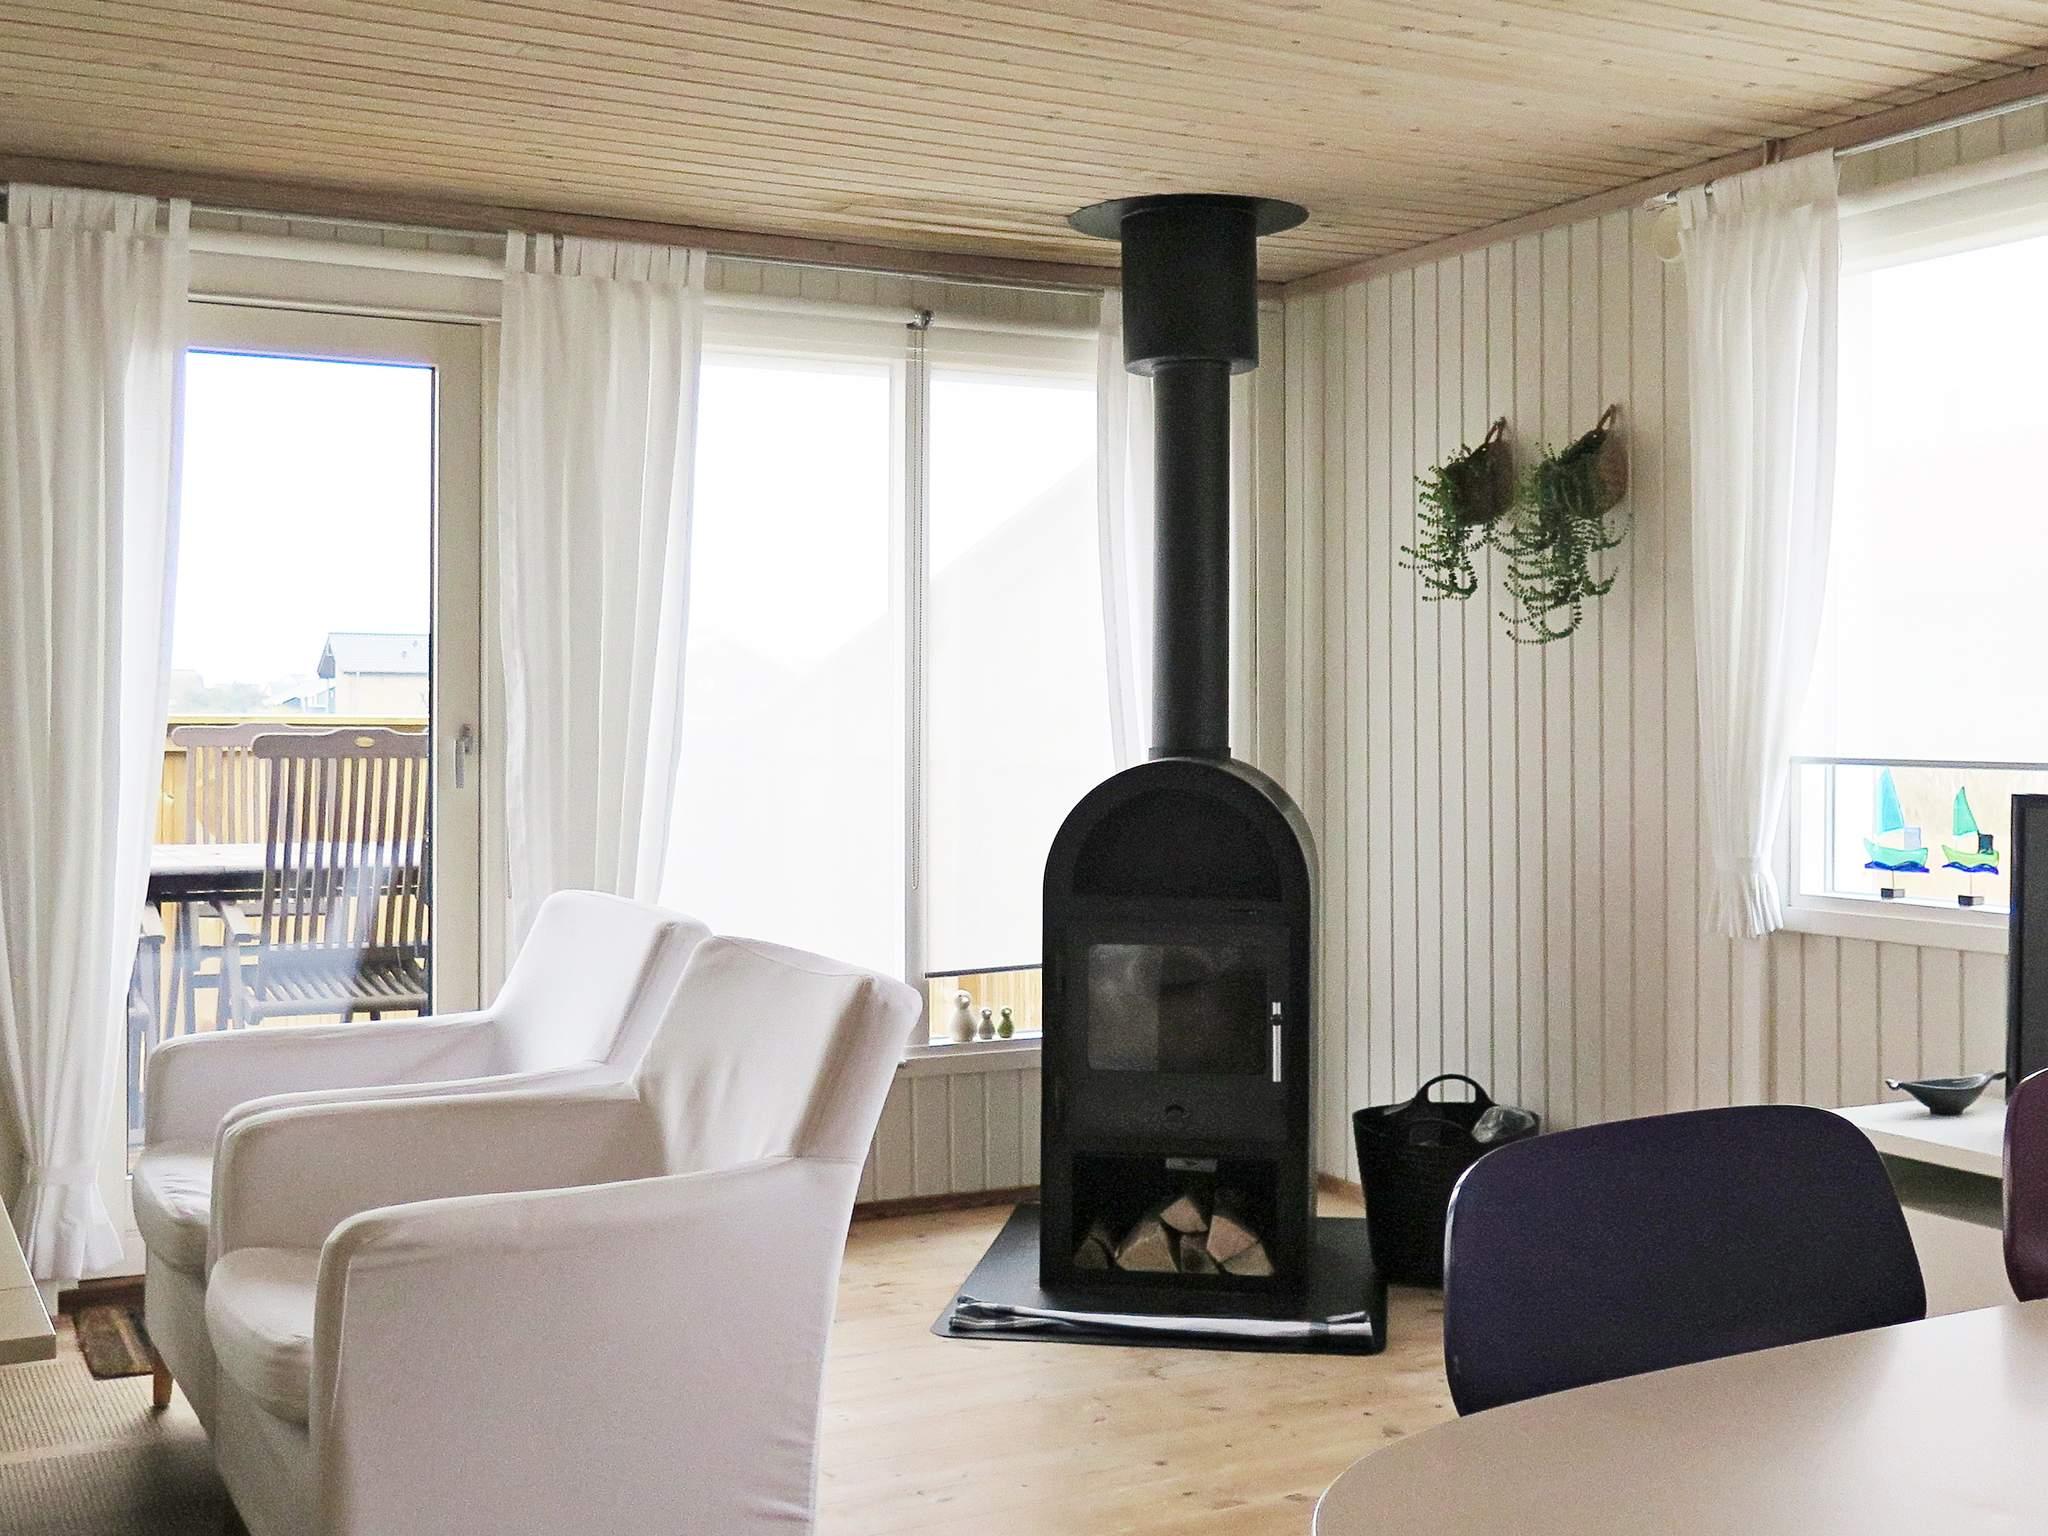 Ferienhaus Vrist (293960), Vrist, , Limfjord, Dänemark, Bild 3